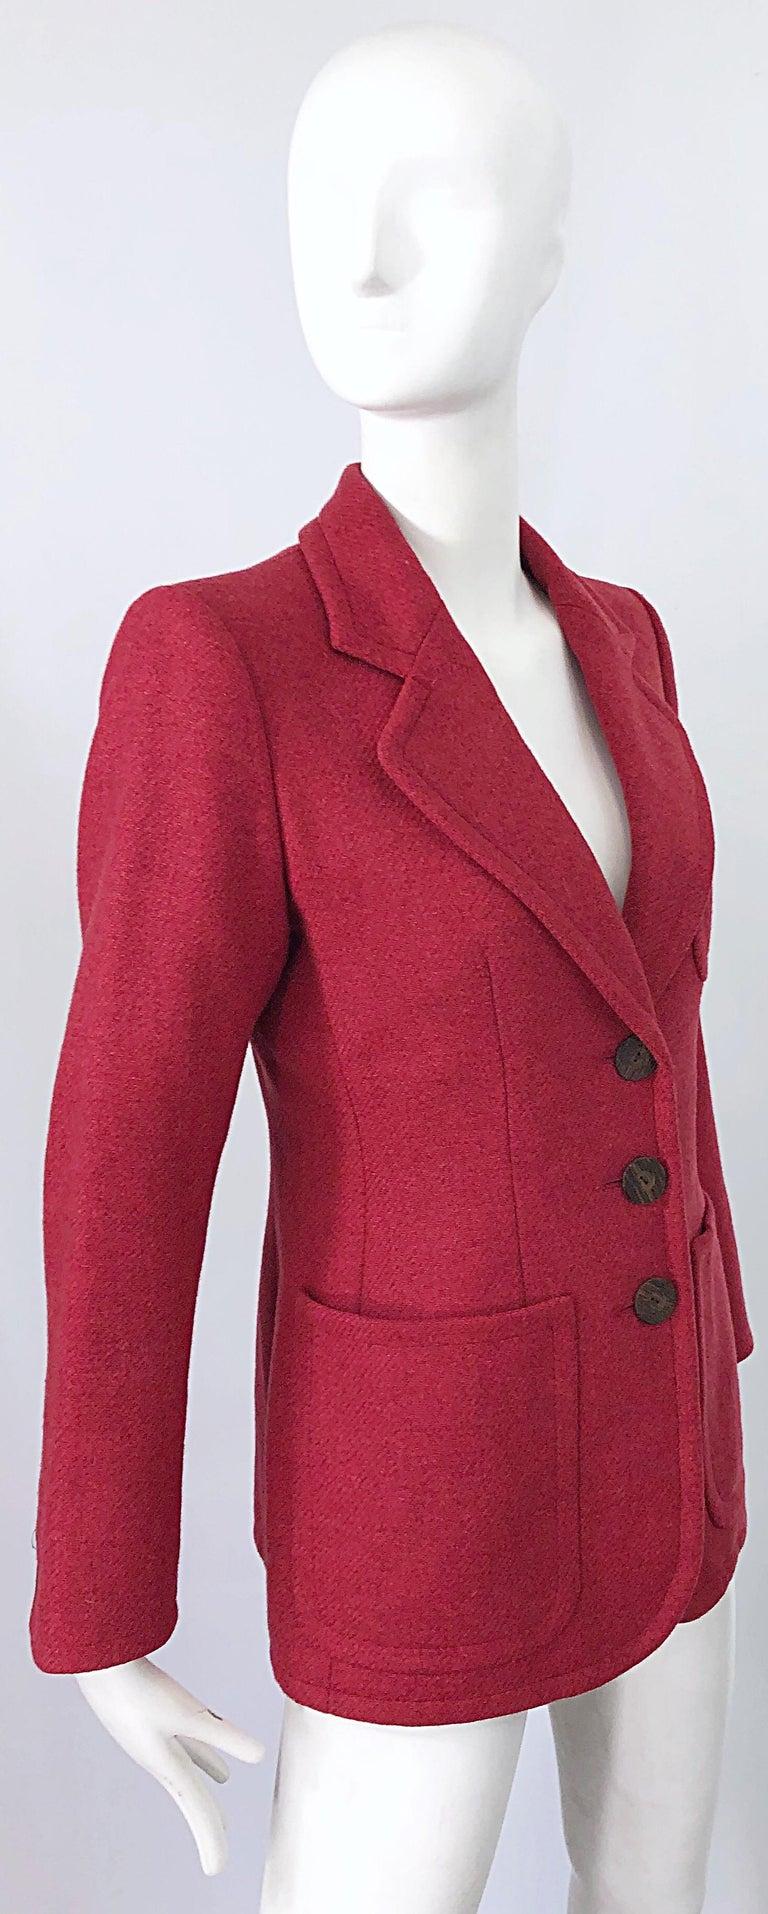 Vintage Yves Saint Laurent 1990s Raspberry Pink Classic 90s Blazer Jacket YSL For Sale 8